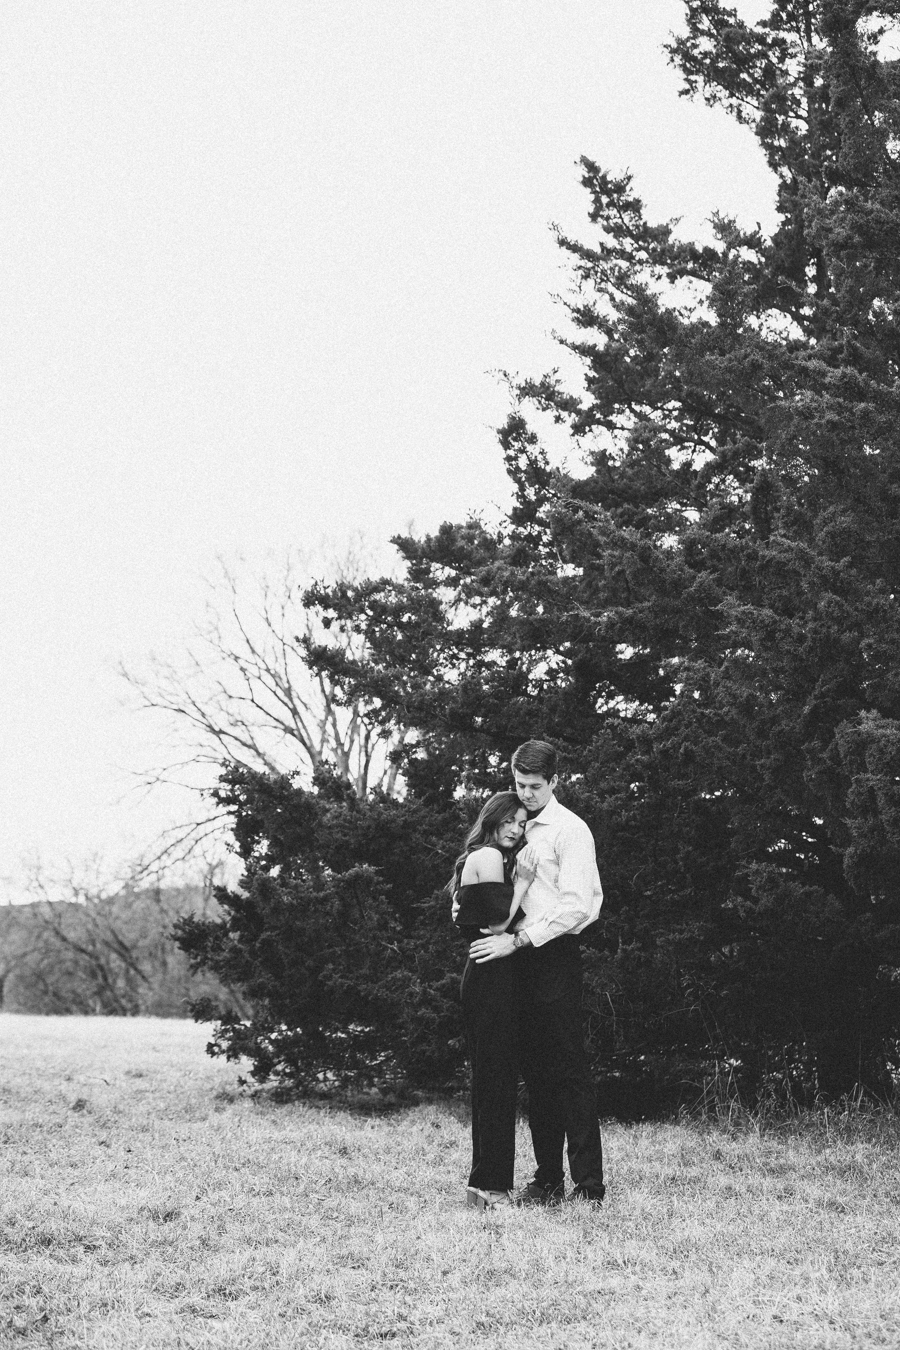 Morgan_John_Enagement_Photography-1-21.jpg